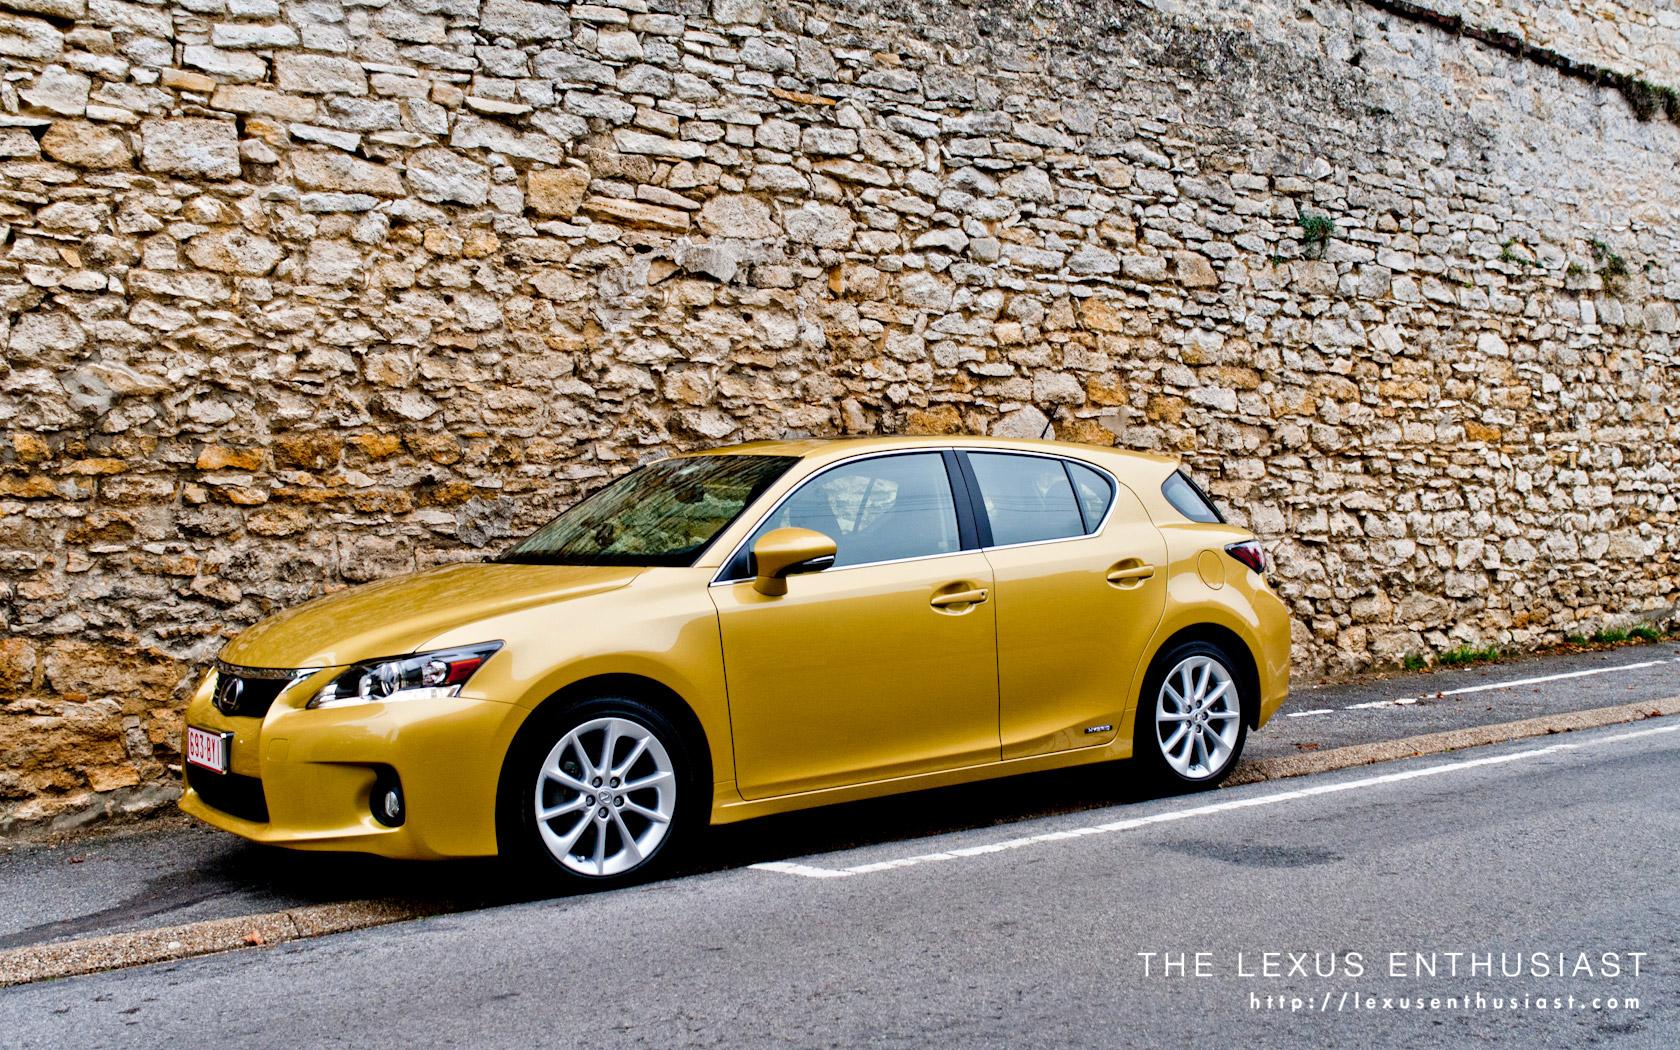 Car Slideshow Wallpaper Lexus Ct 200h In Daybreak Yellow Lexus Enthusiast